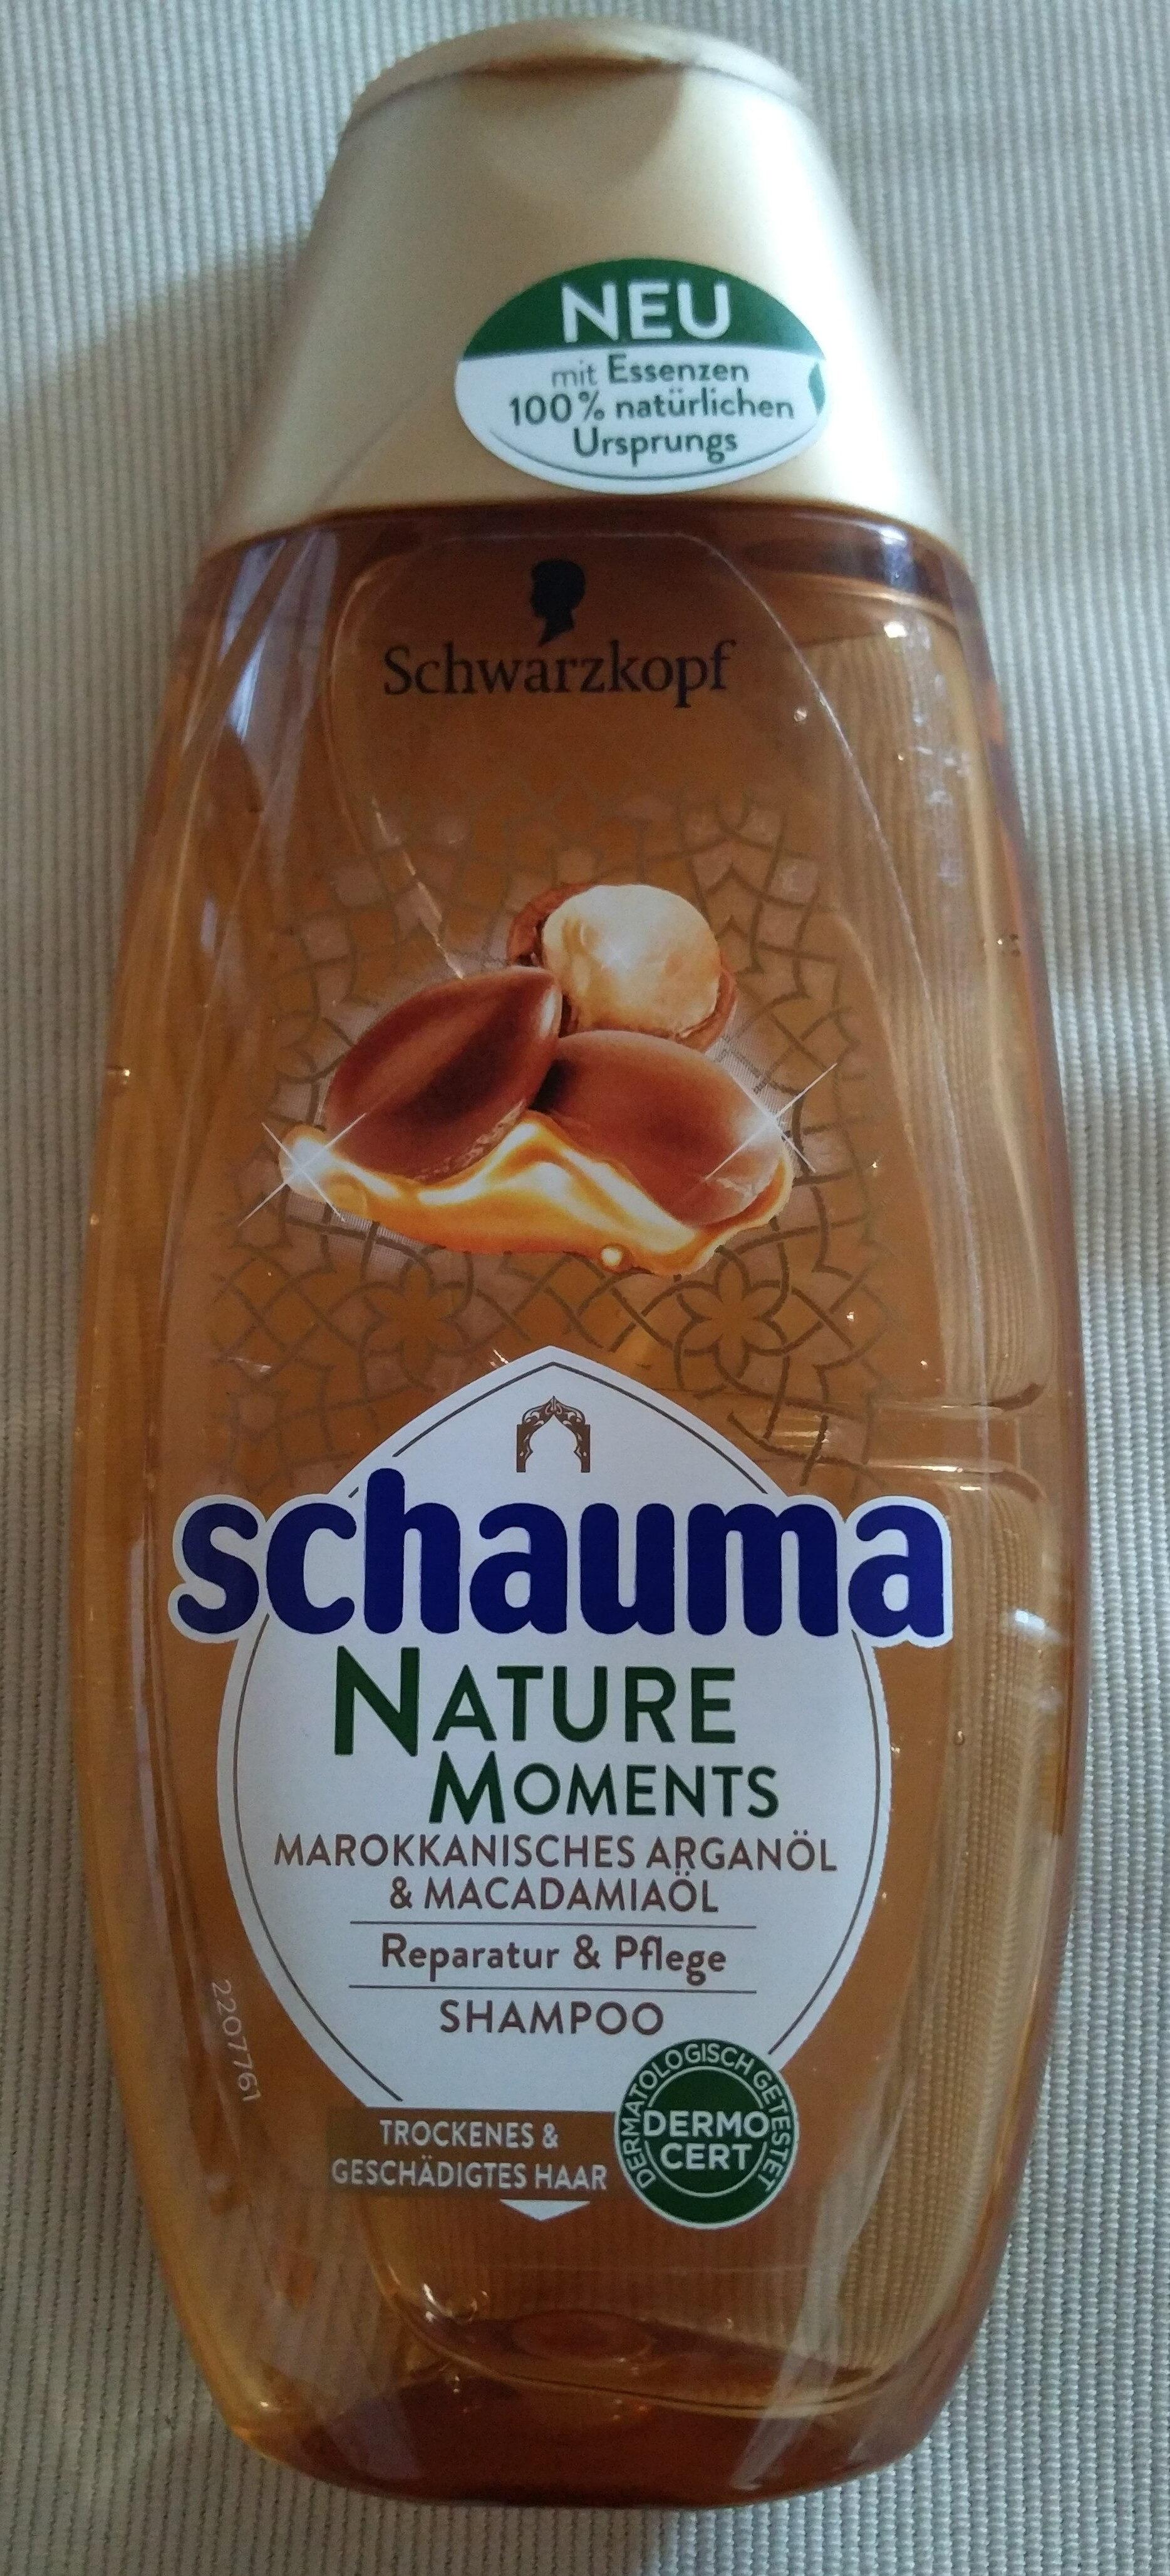 Nature Moments - Shampoo (Marokkanisches Arganöl & Macadamiaöl) - Produit - de